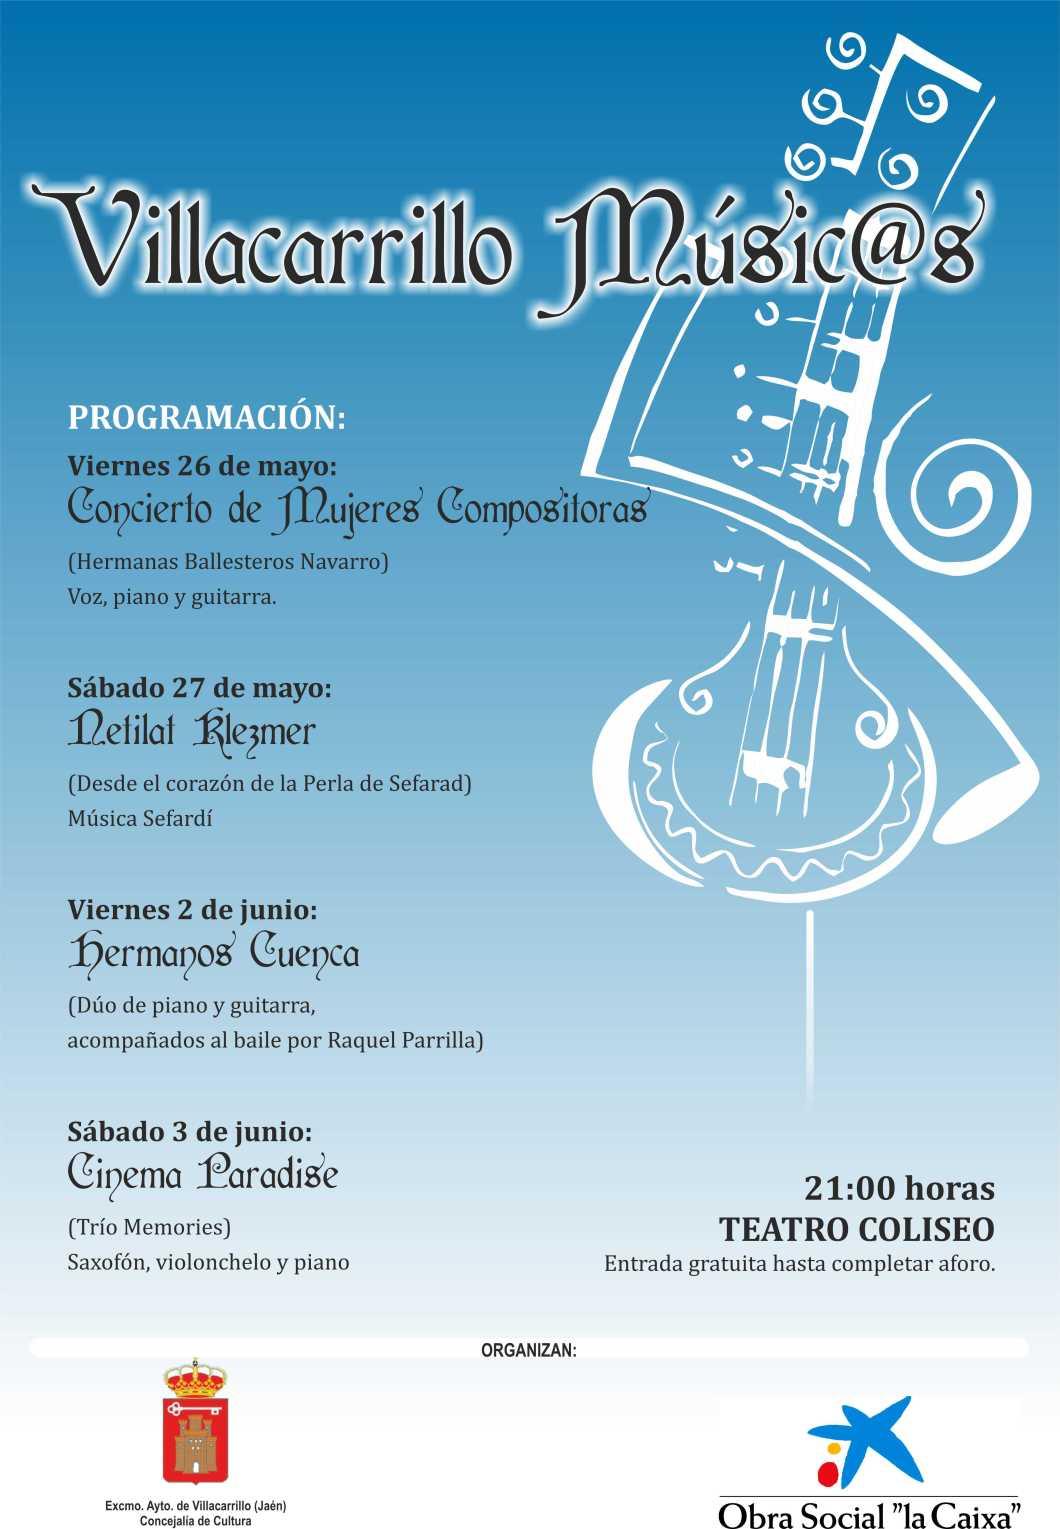 CARTEL VILLACARRILLO MUSICS (2)